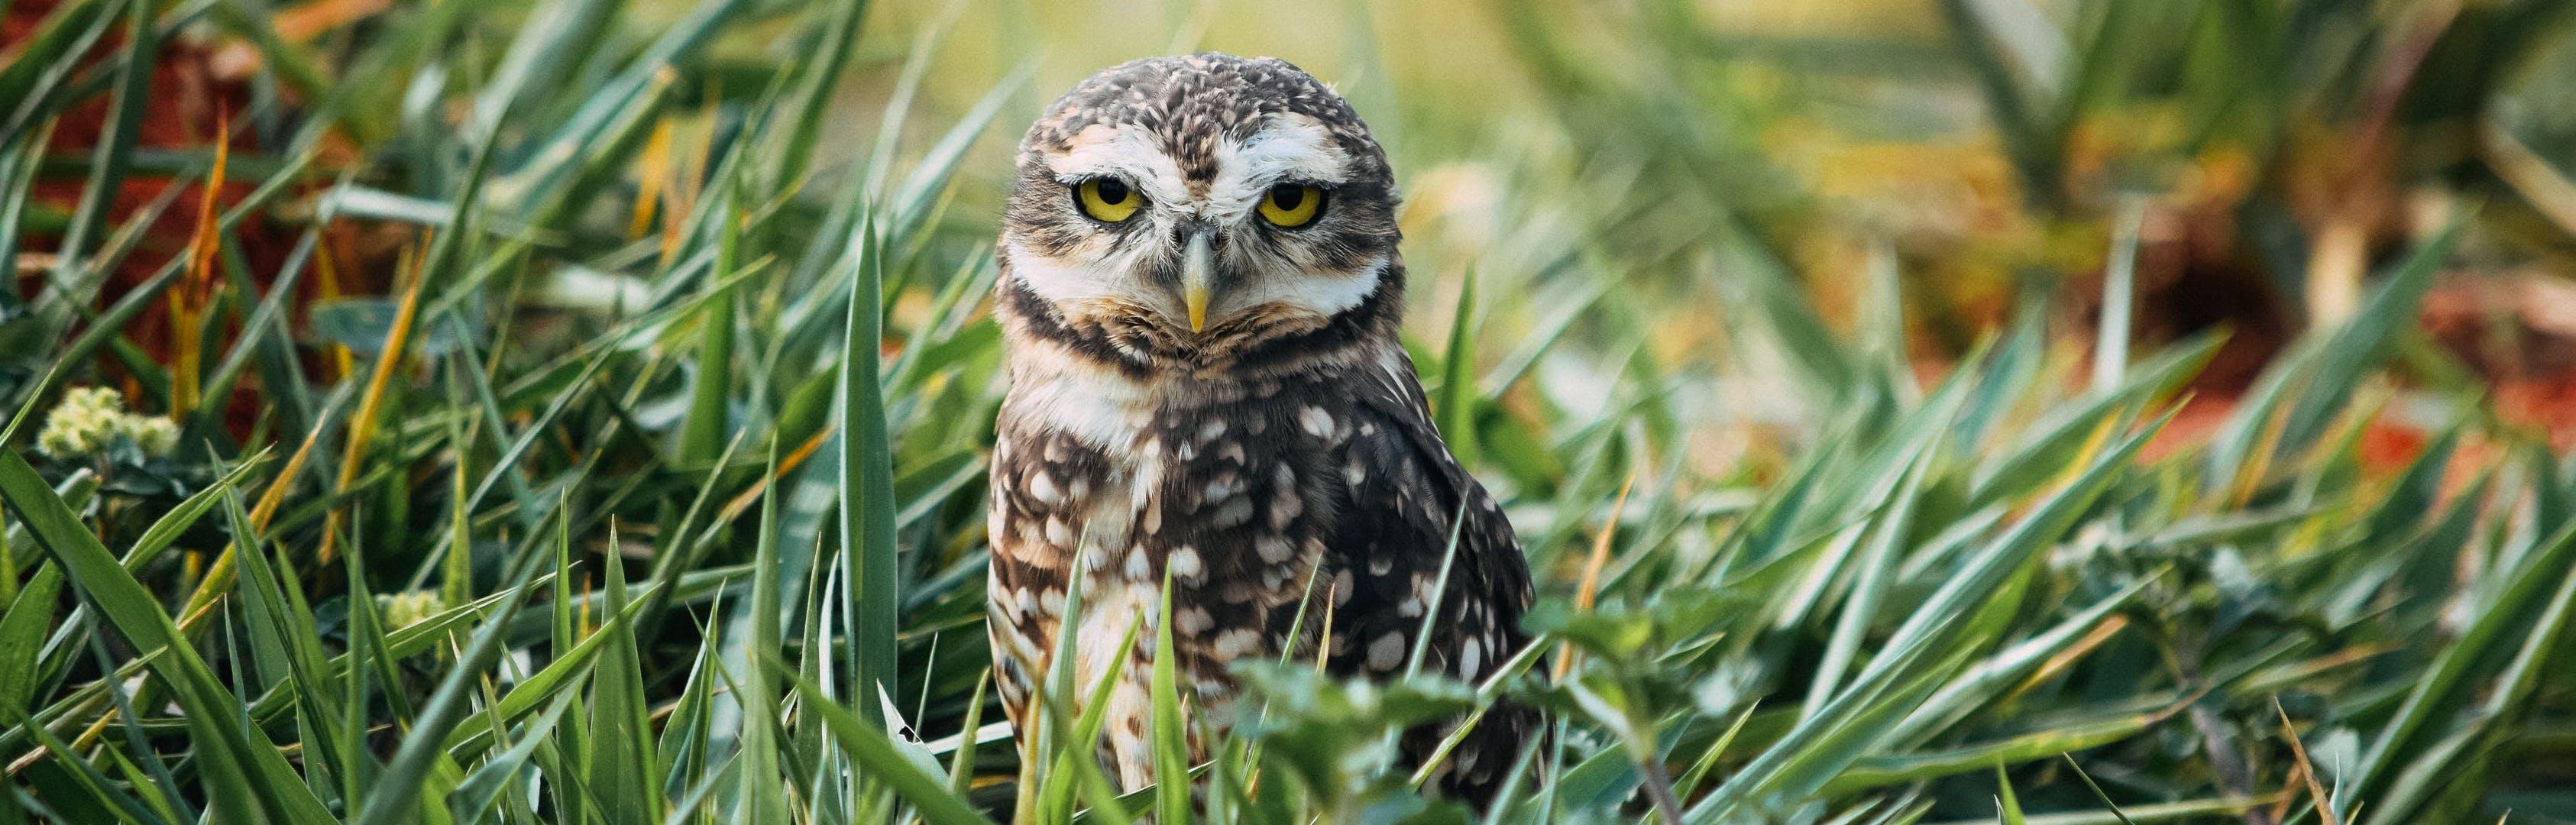 western burrowing owl banner